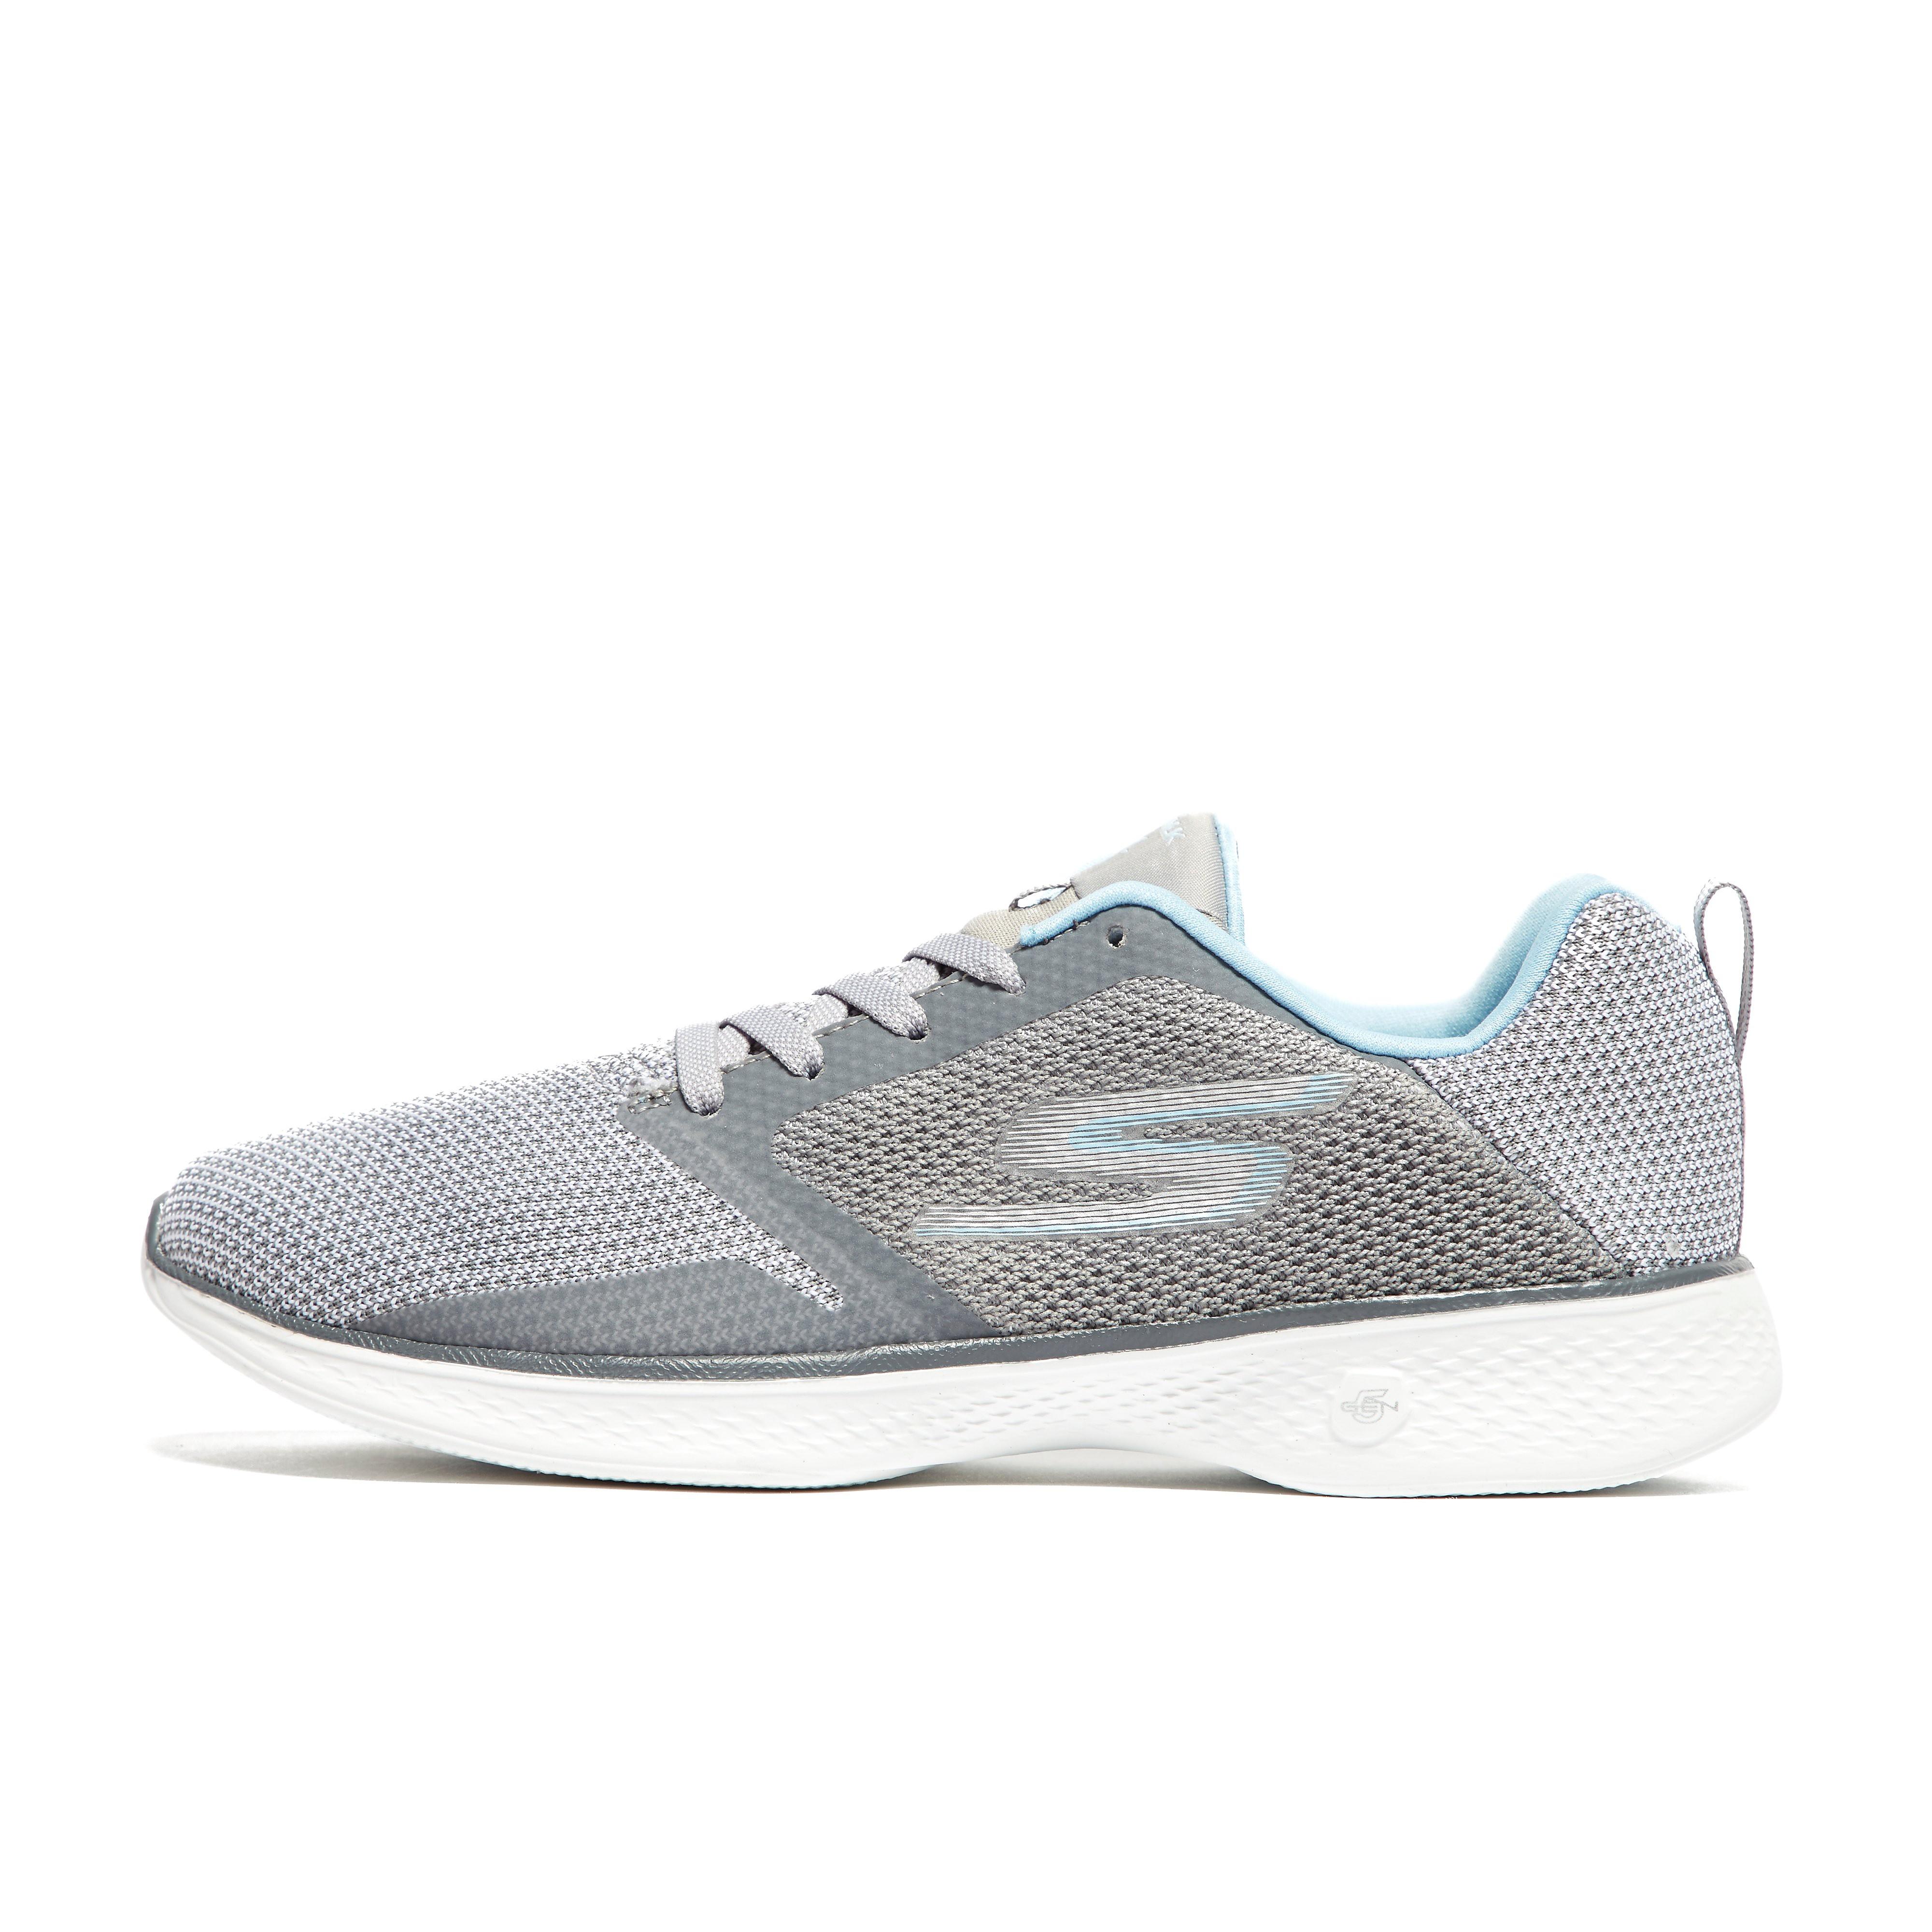 Skechers Go Walk 4 Women's Training Shoes